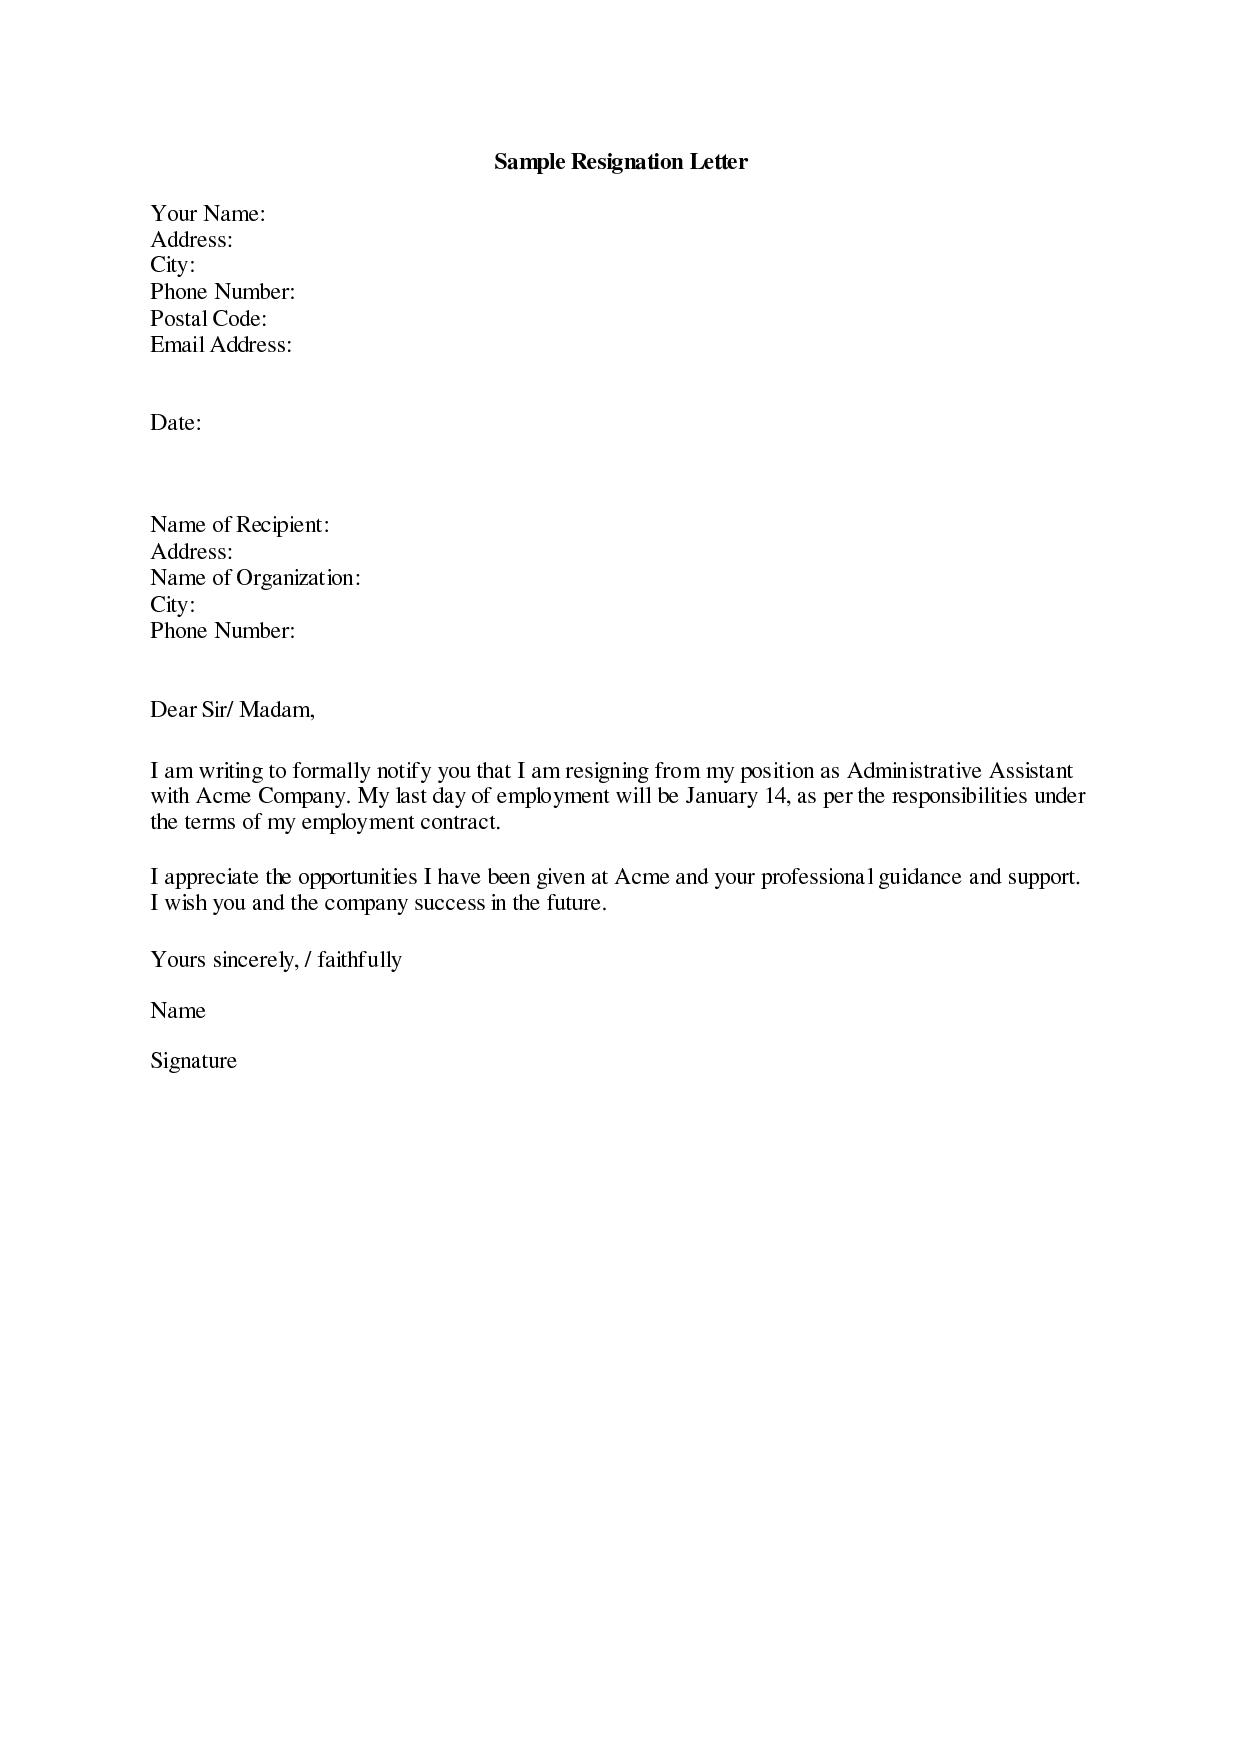 Retirement Resignation Letter Template Free - Resignation Letter Sample 19 Letter Of Resignation